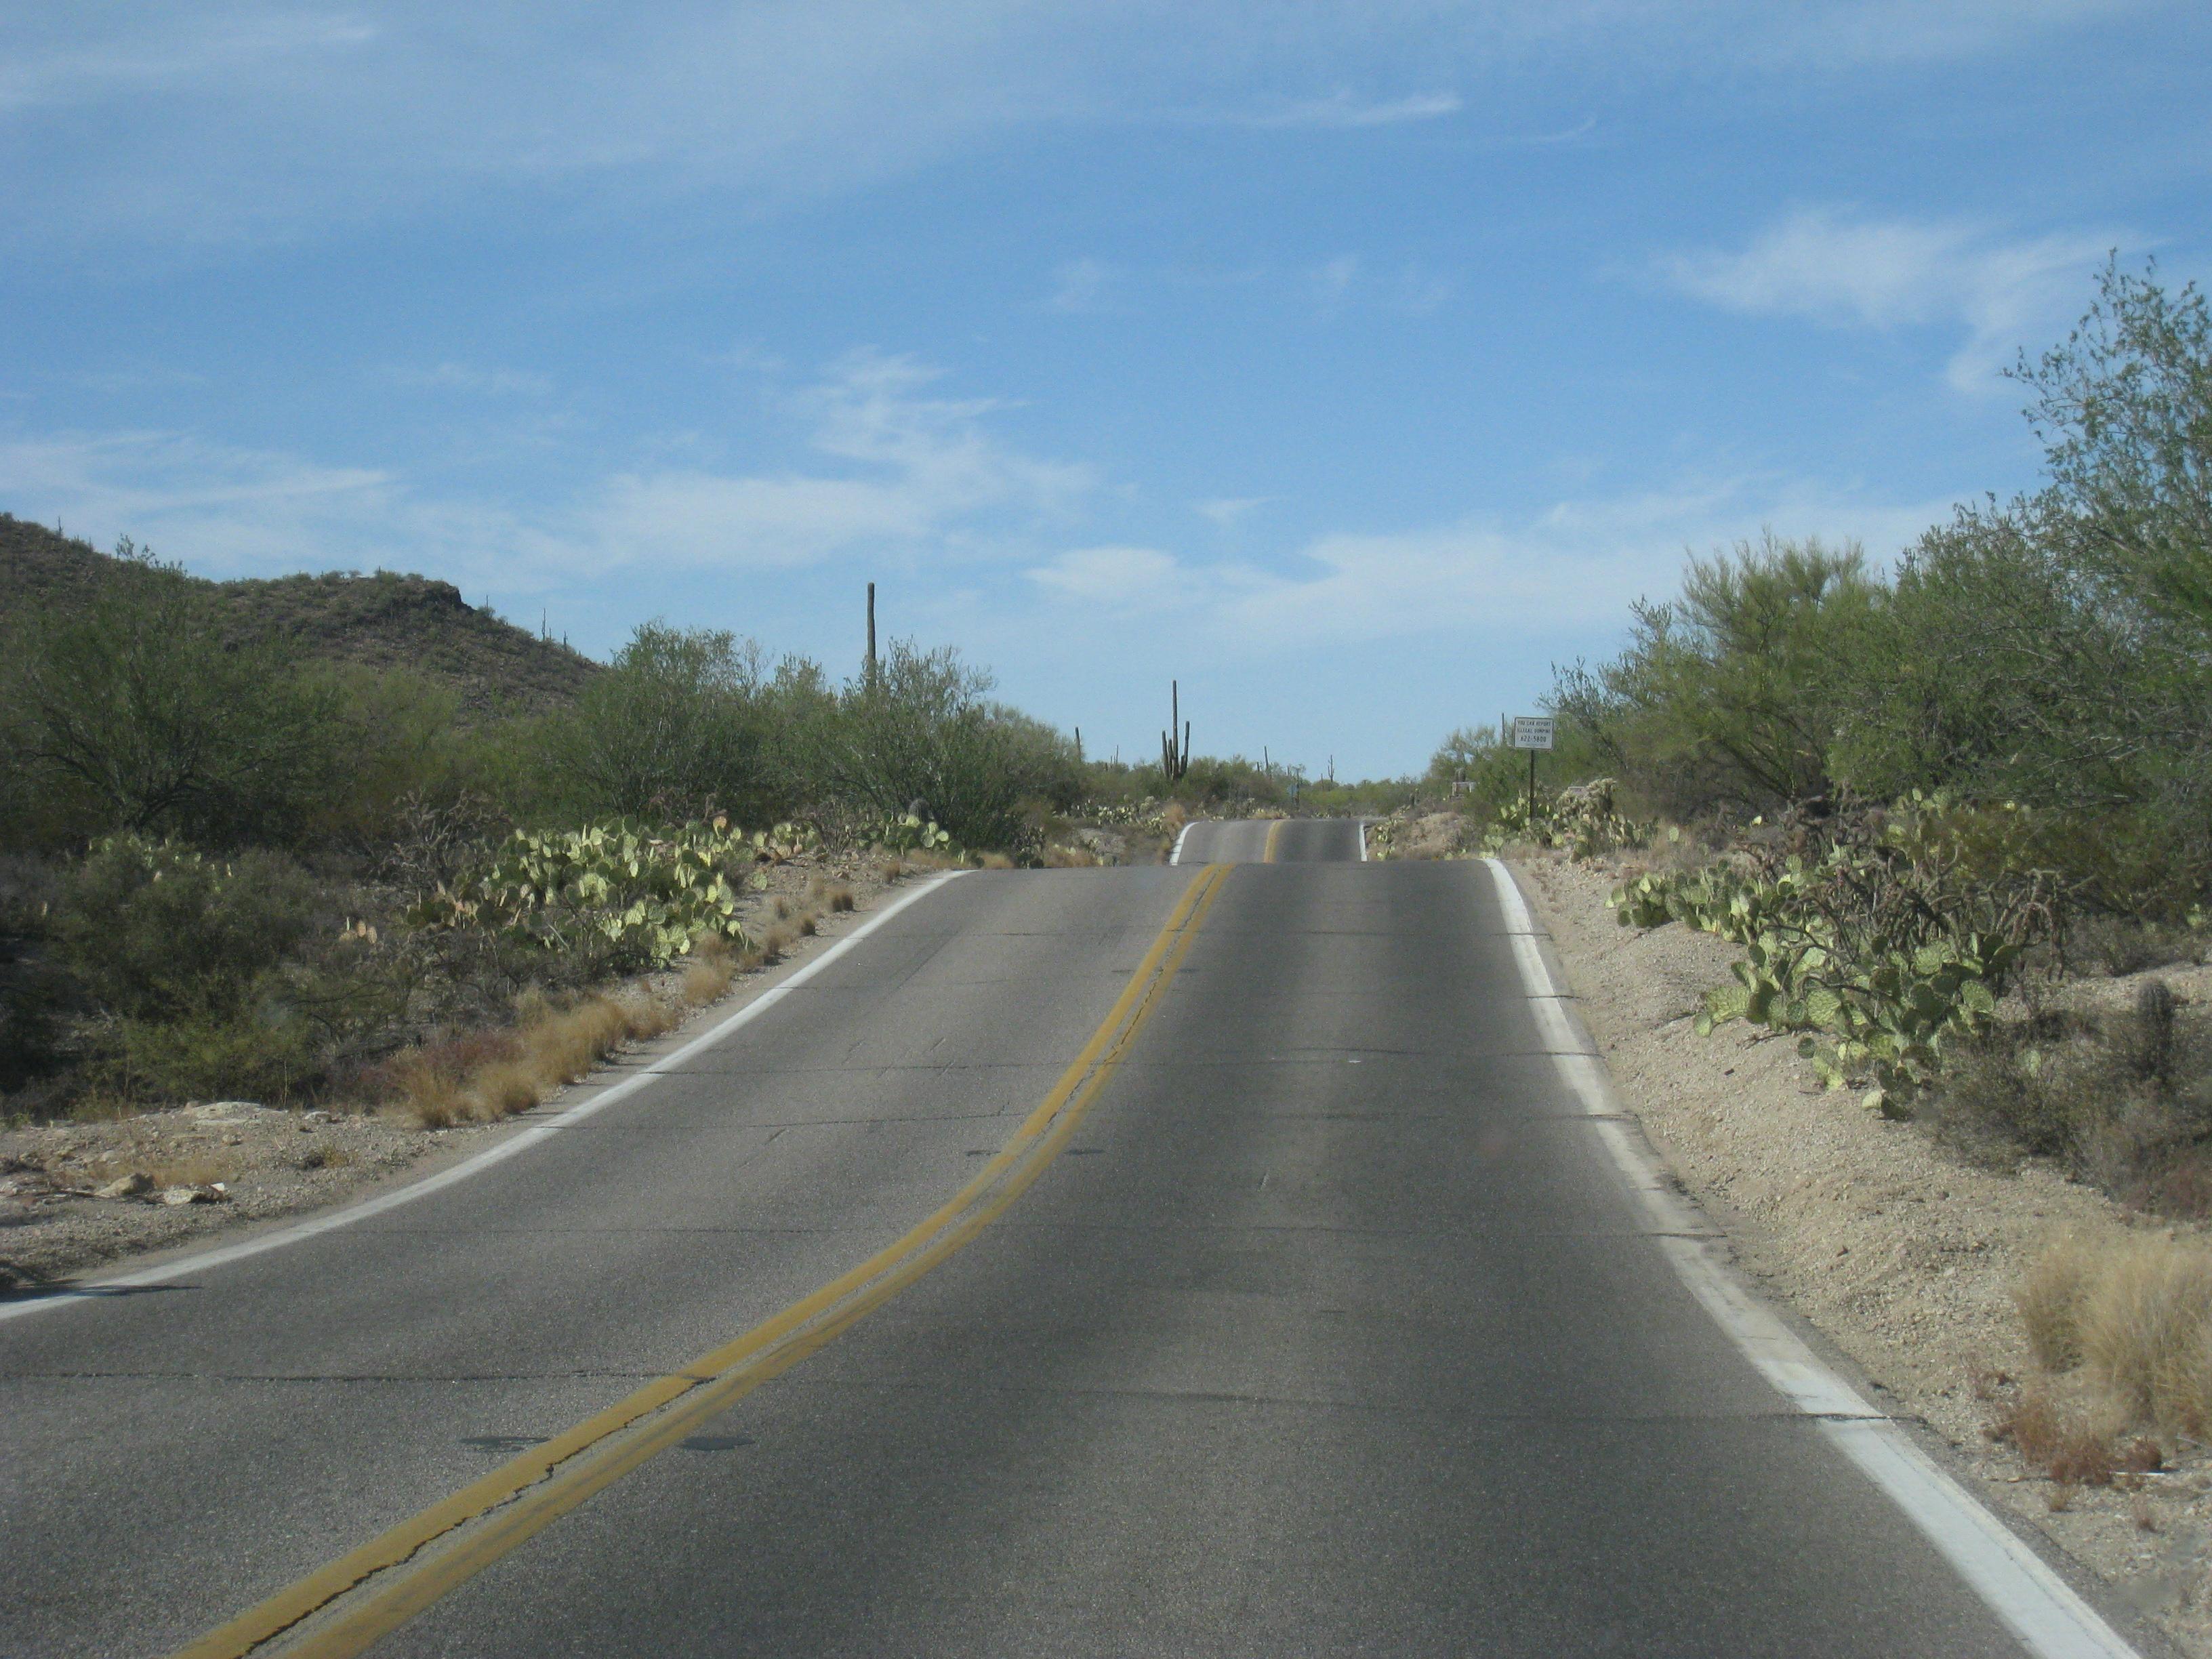 Arizona Desert Road wallpaper   ForWallpapercom 3264x2448